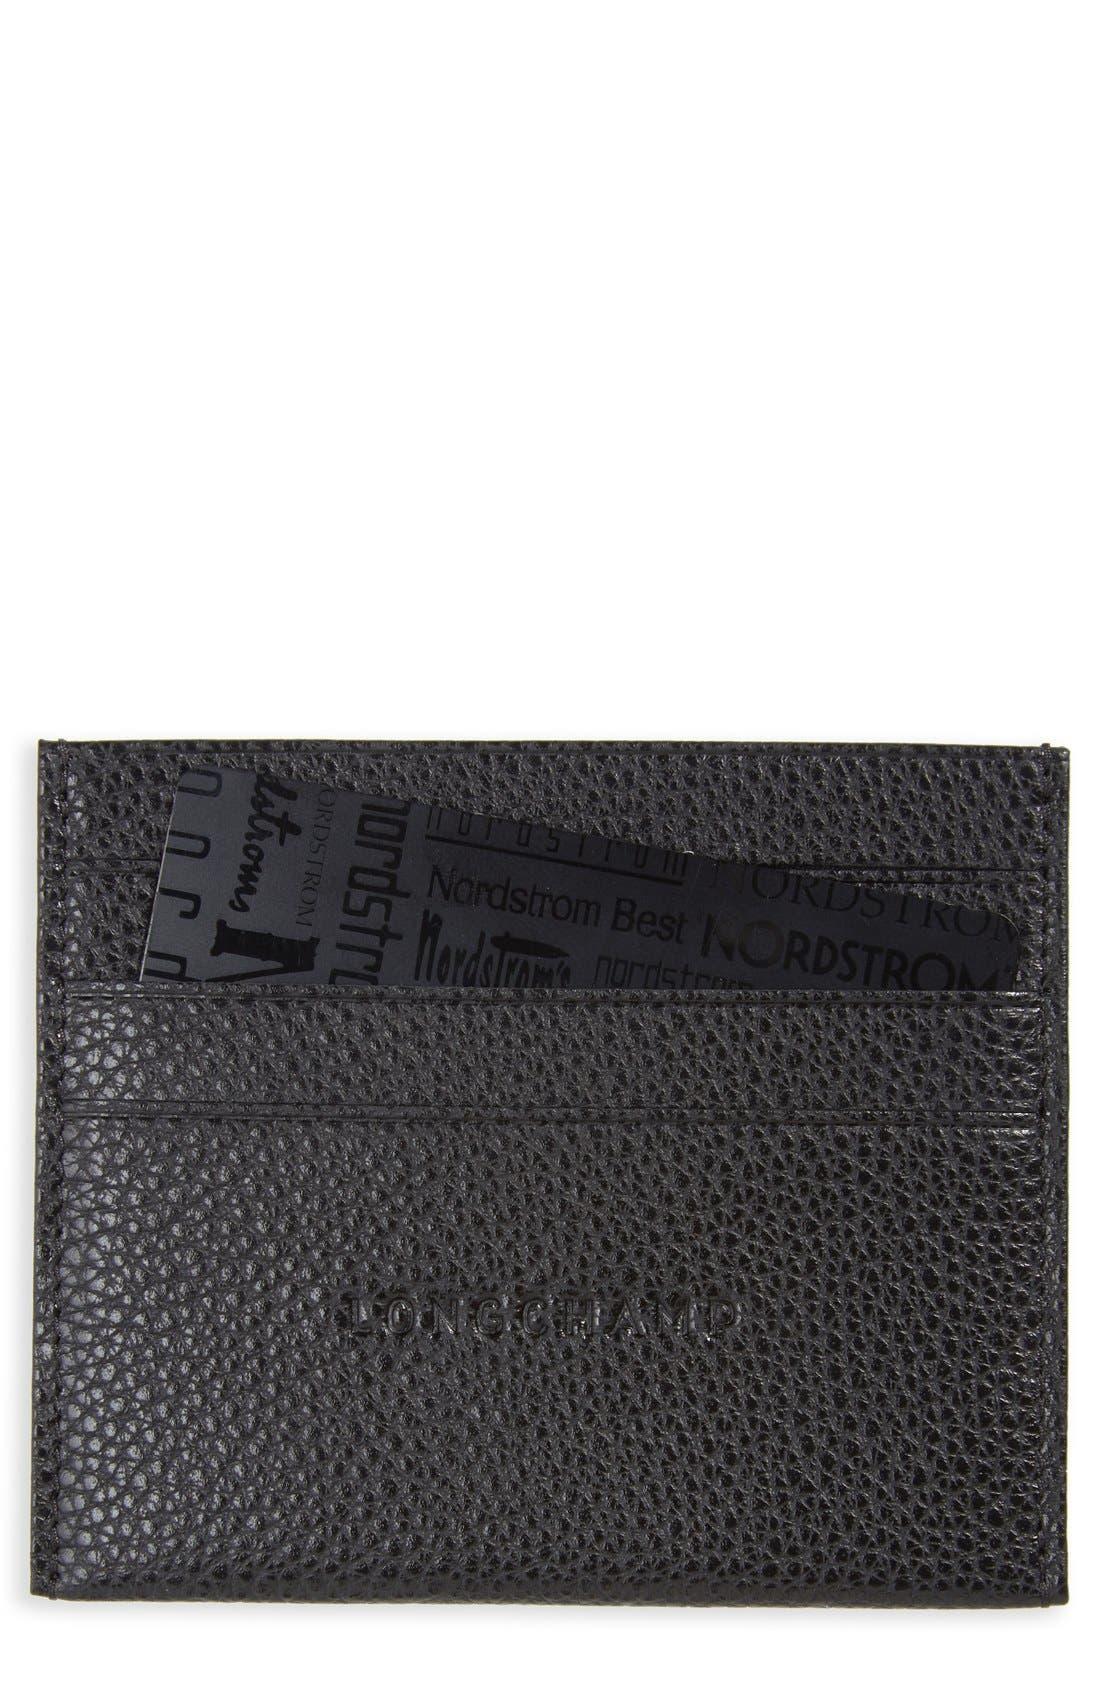 'Le Foulonne' Pebbled Leather Card Holder,                             Main thumbnail 1, color,                             BLACK